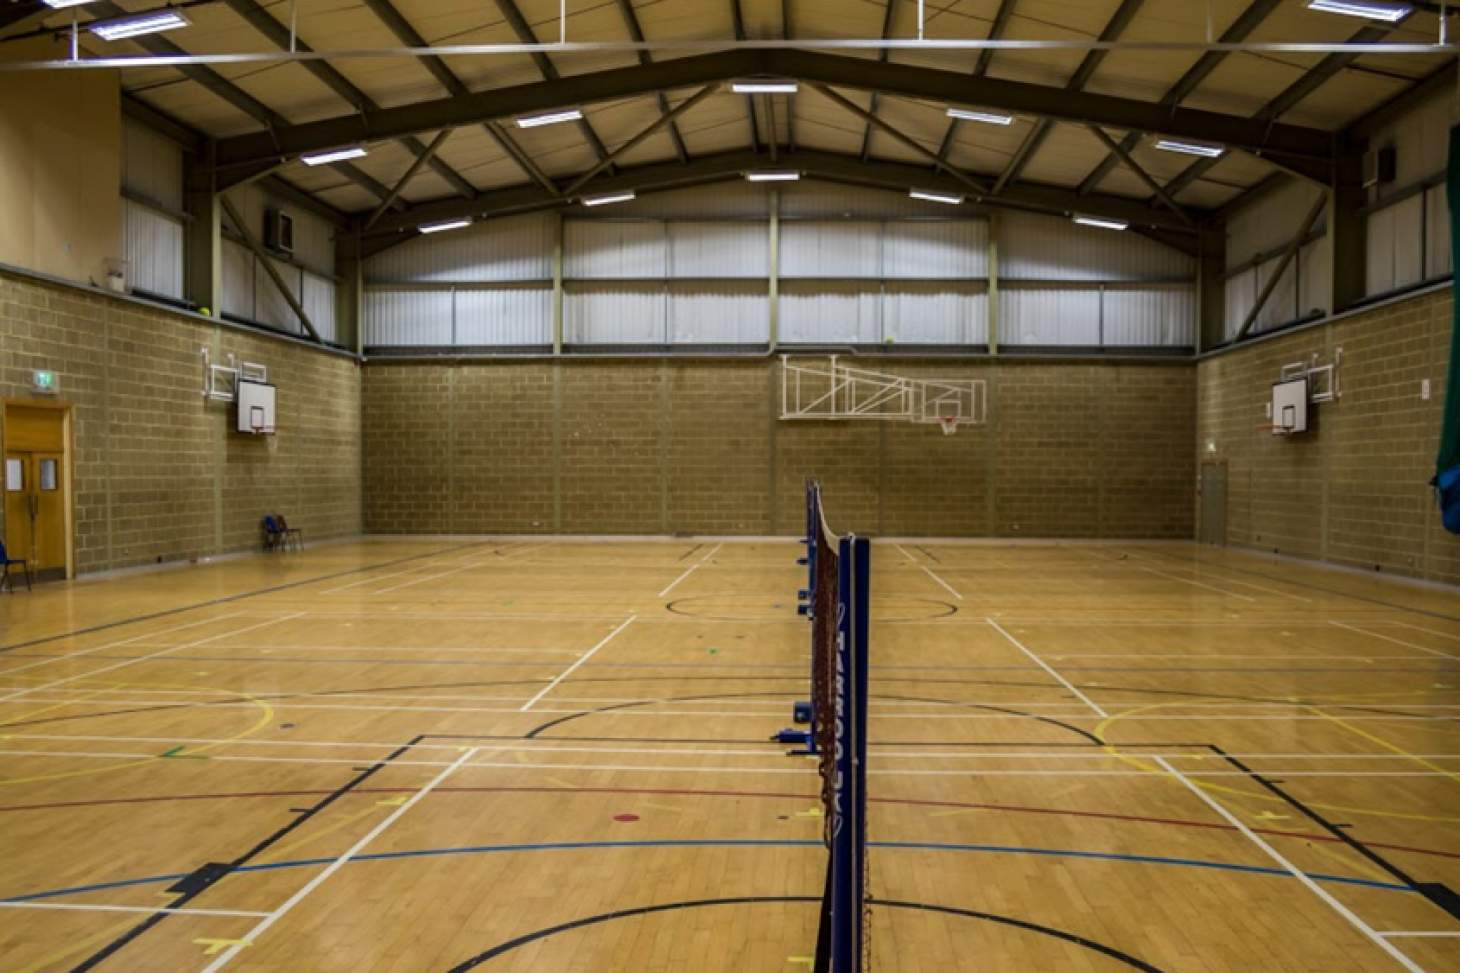 Portslade Sports Centre Indoor | Hard badminton court